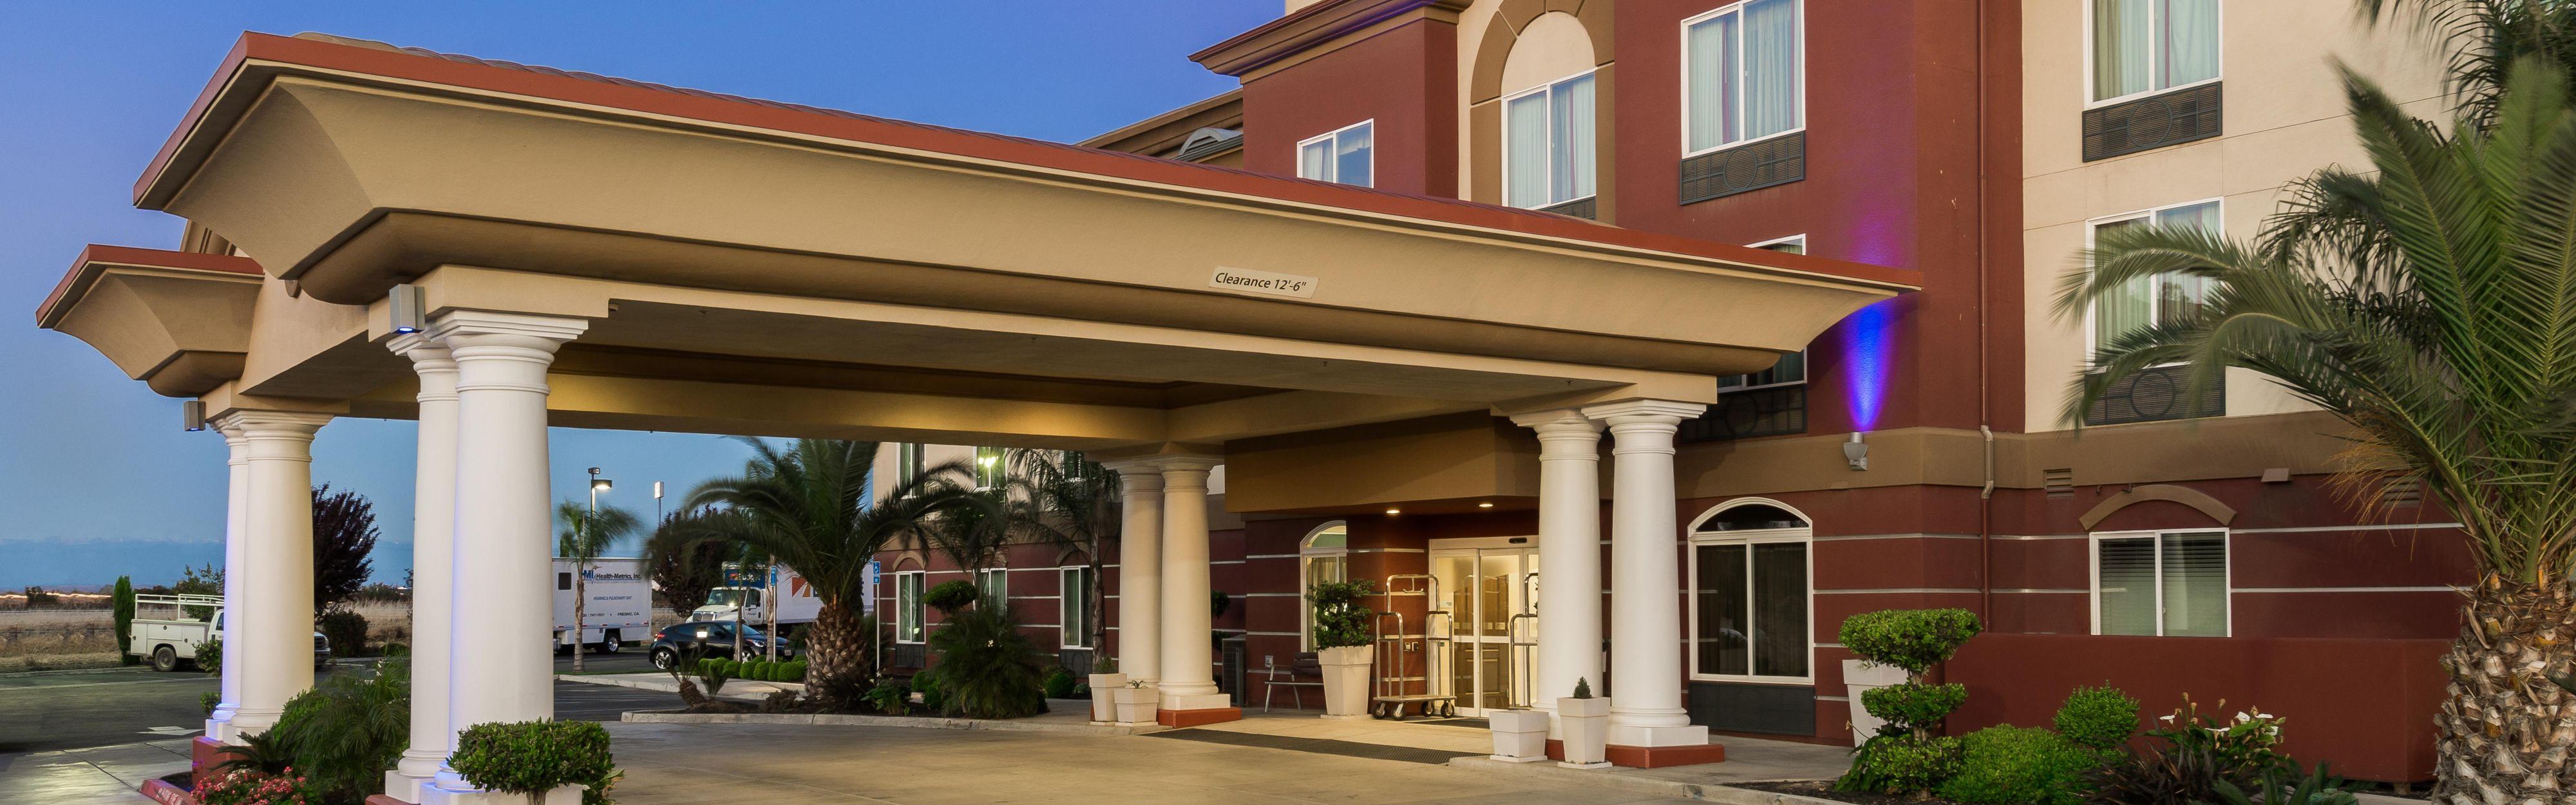 Holiday Inn Express & Suites Chowchilla - Yosemite Pk Area image 0